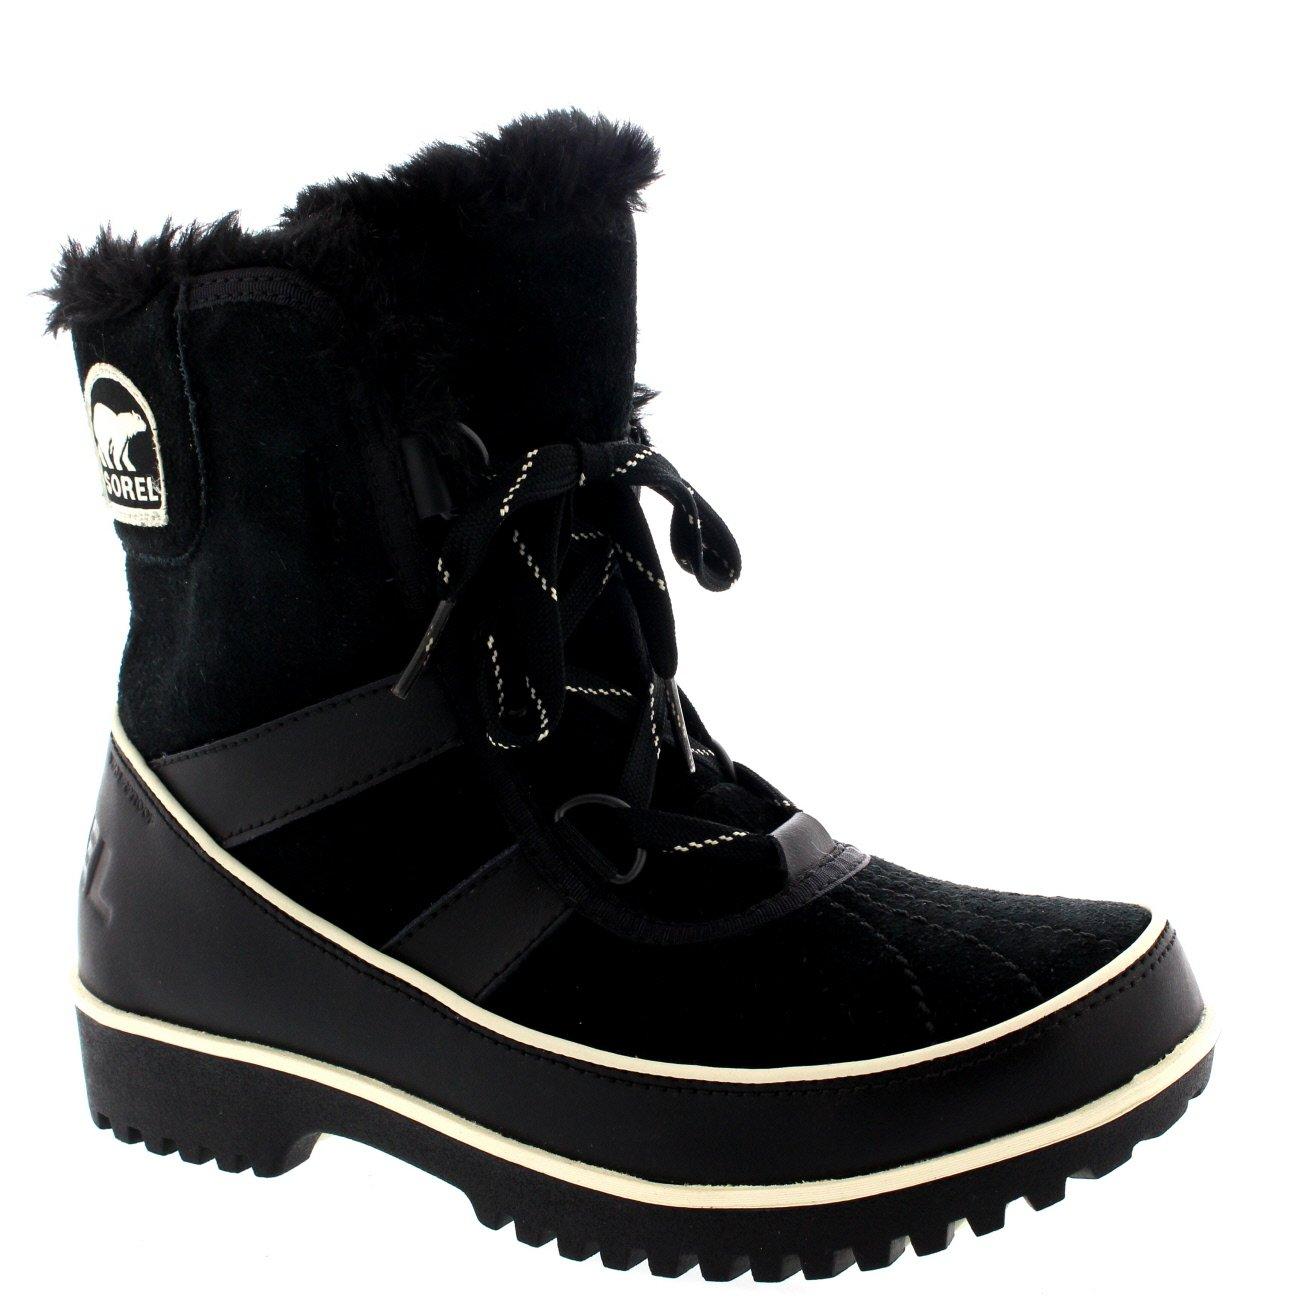 Womens Sorel Tivolli Ii Winter Waterproof Fur Boots Snow Lace Up Rain - Black - 7 by SOREL